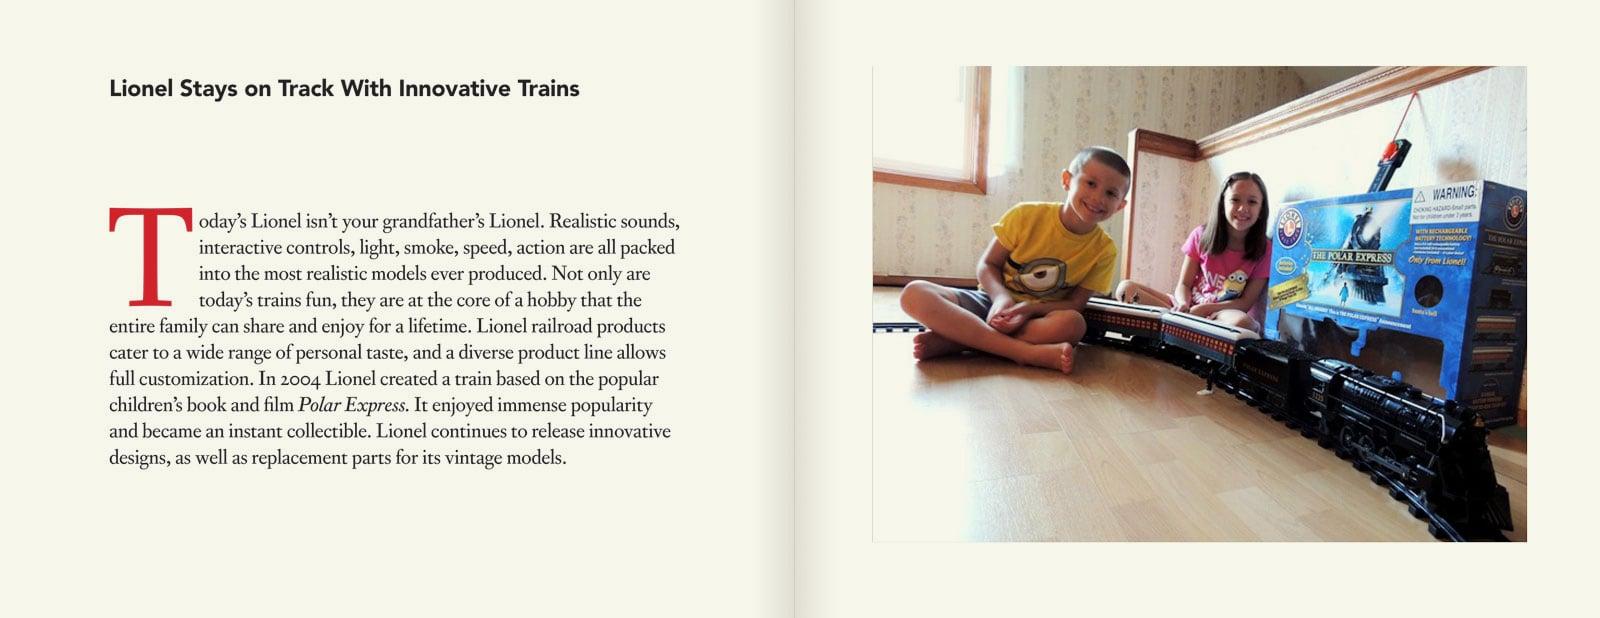 6-Lionel_Book-innovative.jpg